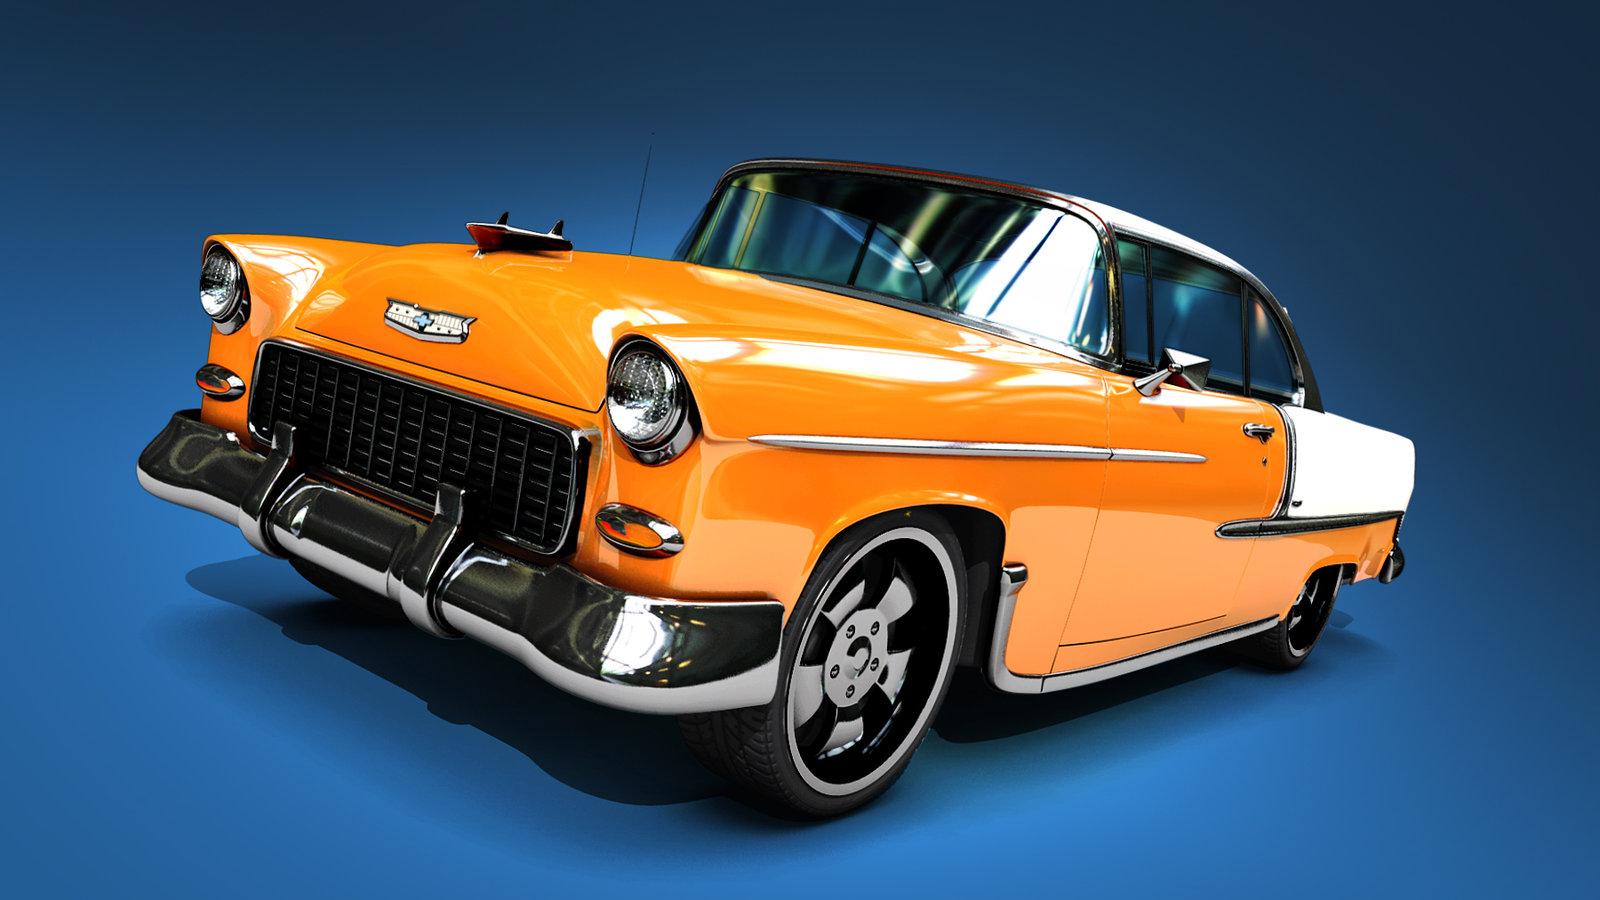 1955 Chevy Bel Air by kylecbastian on deviantART 1600x900